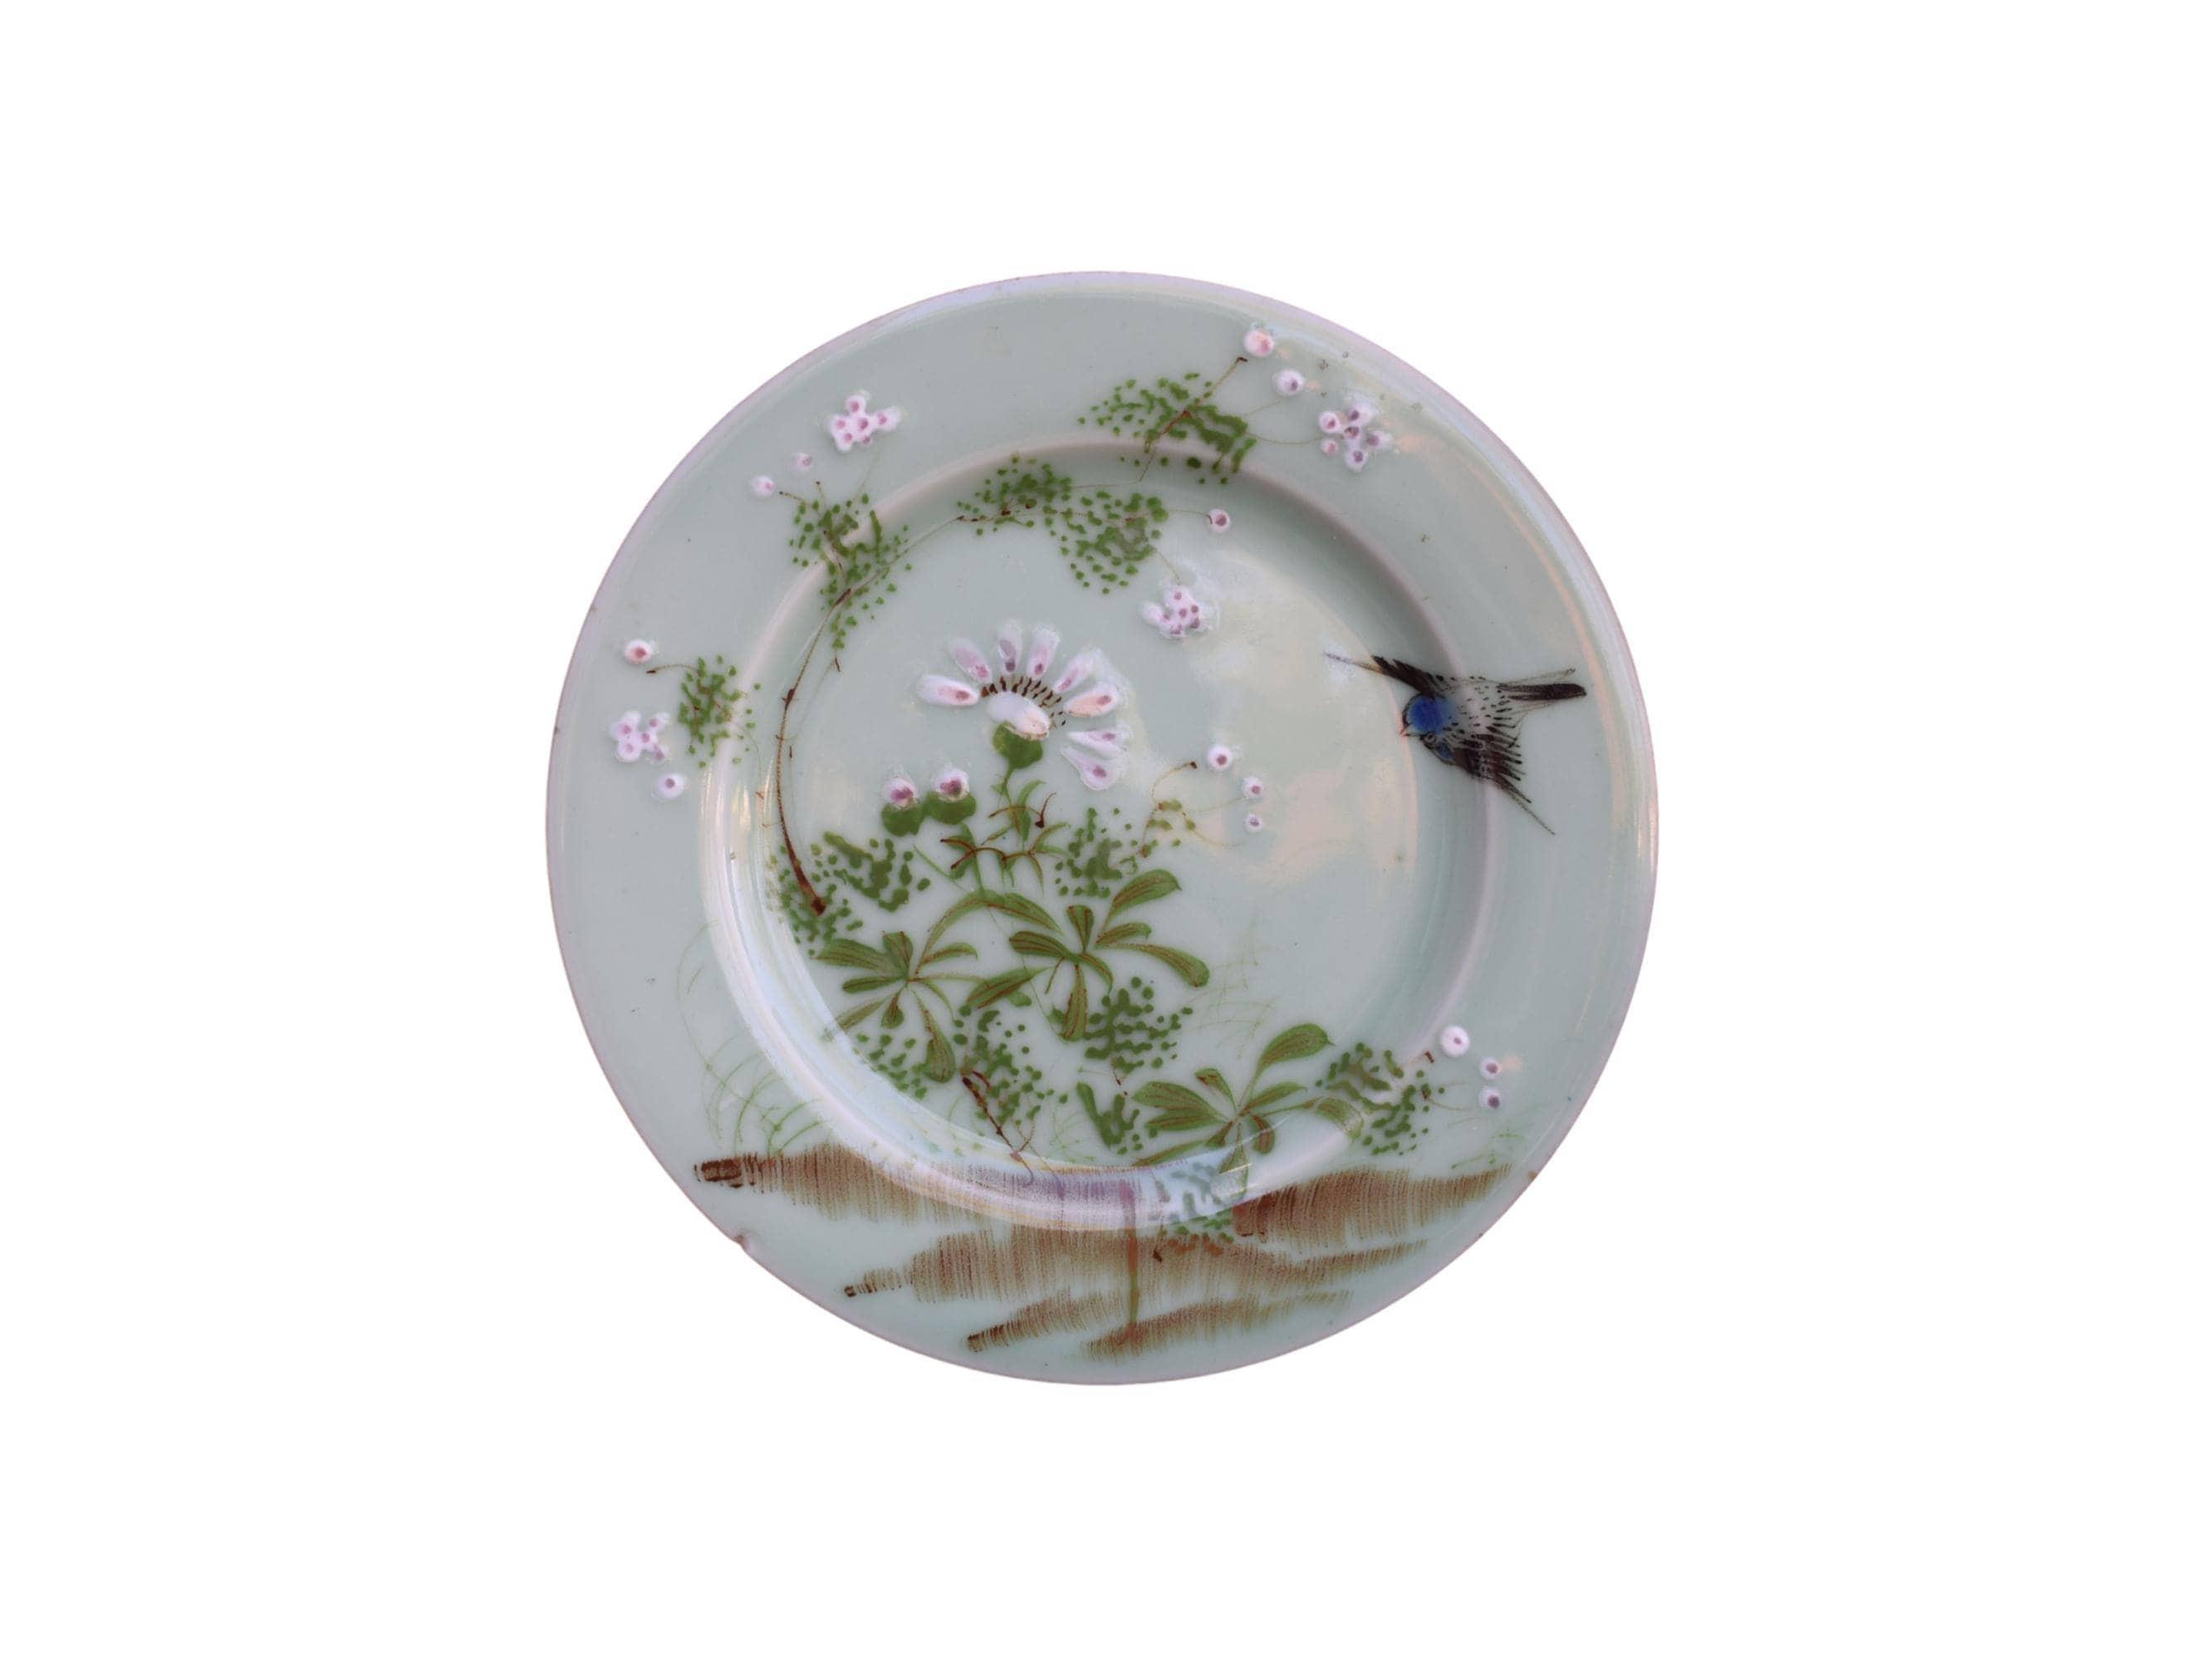 Antique Japanese Celadon Plate Bird and Flower Celadon ...